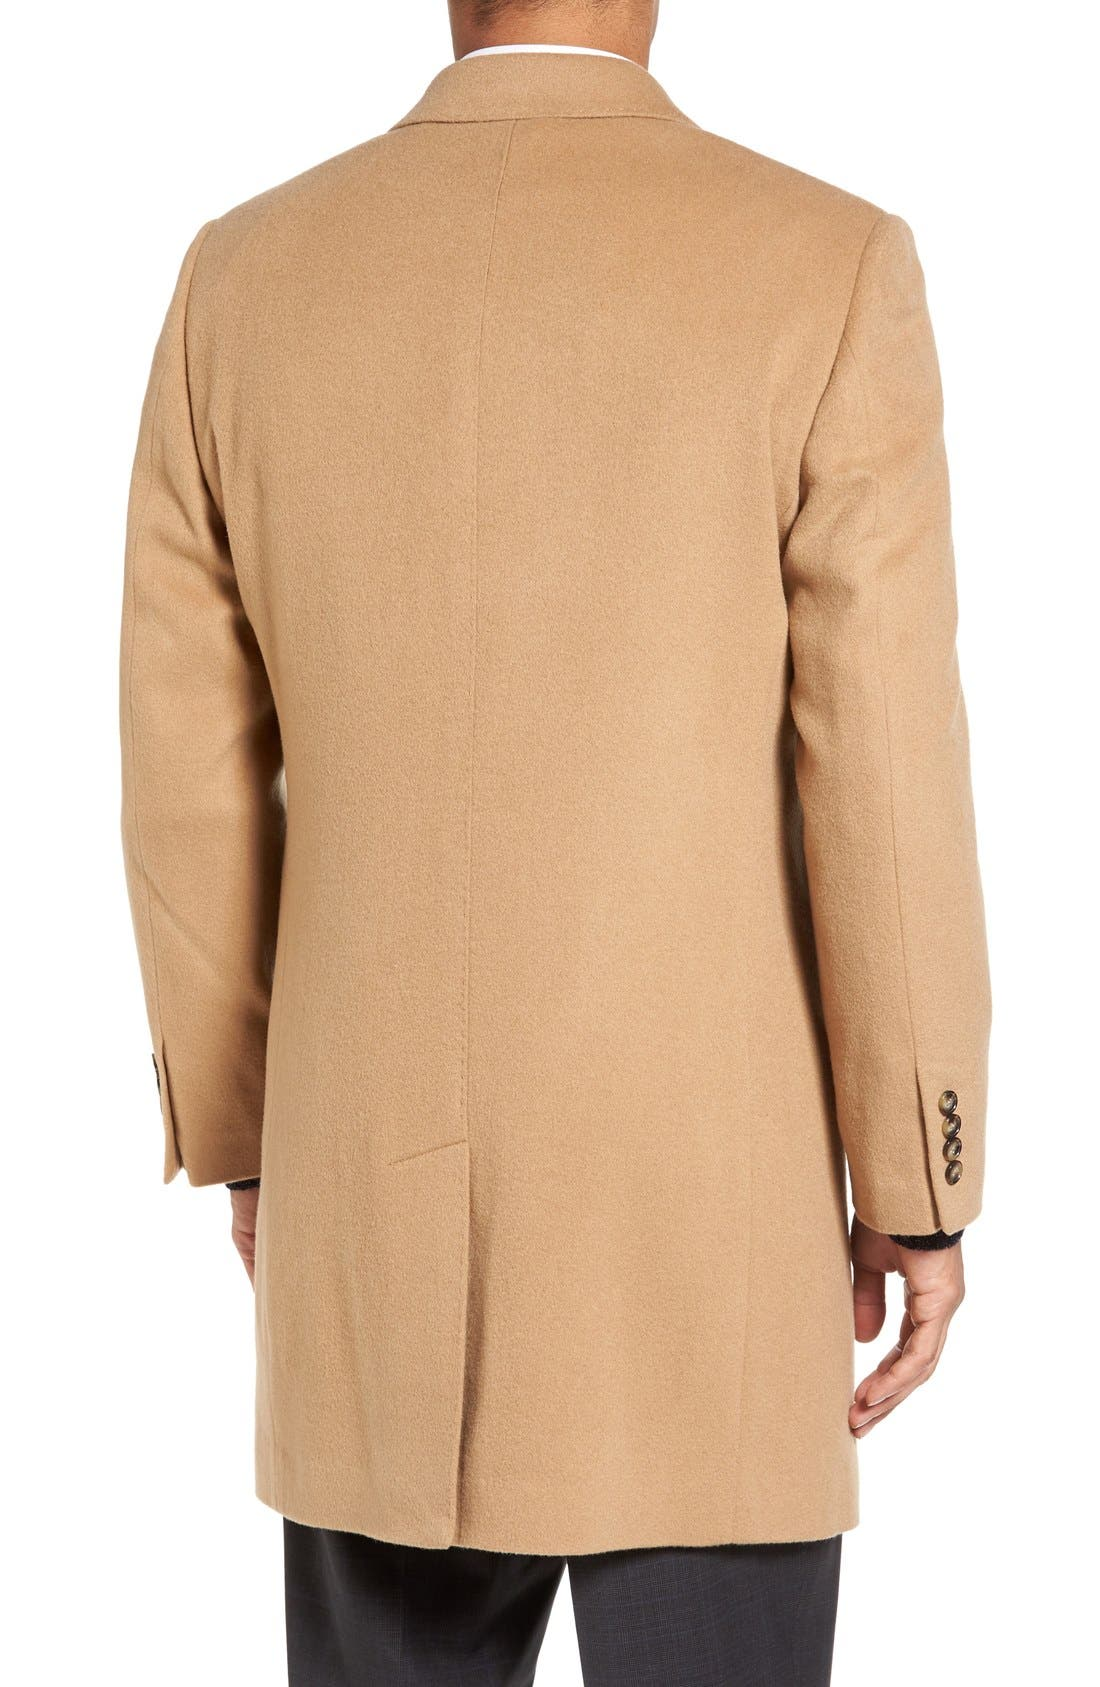 Alternate Image 2  - Nordstrom Men's Shop Freemont Wool & Cashmere Overcoat